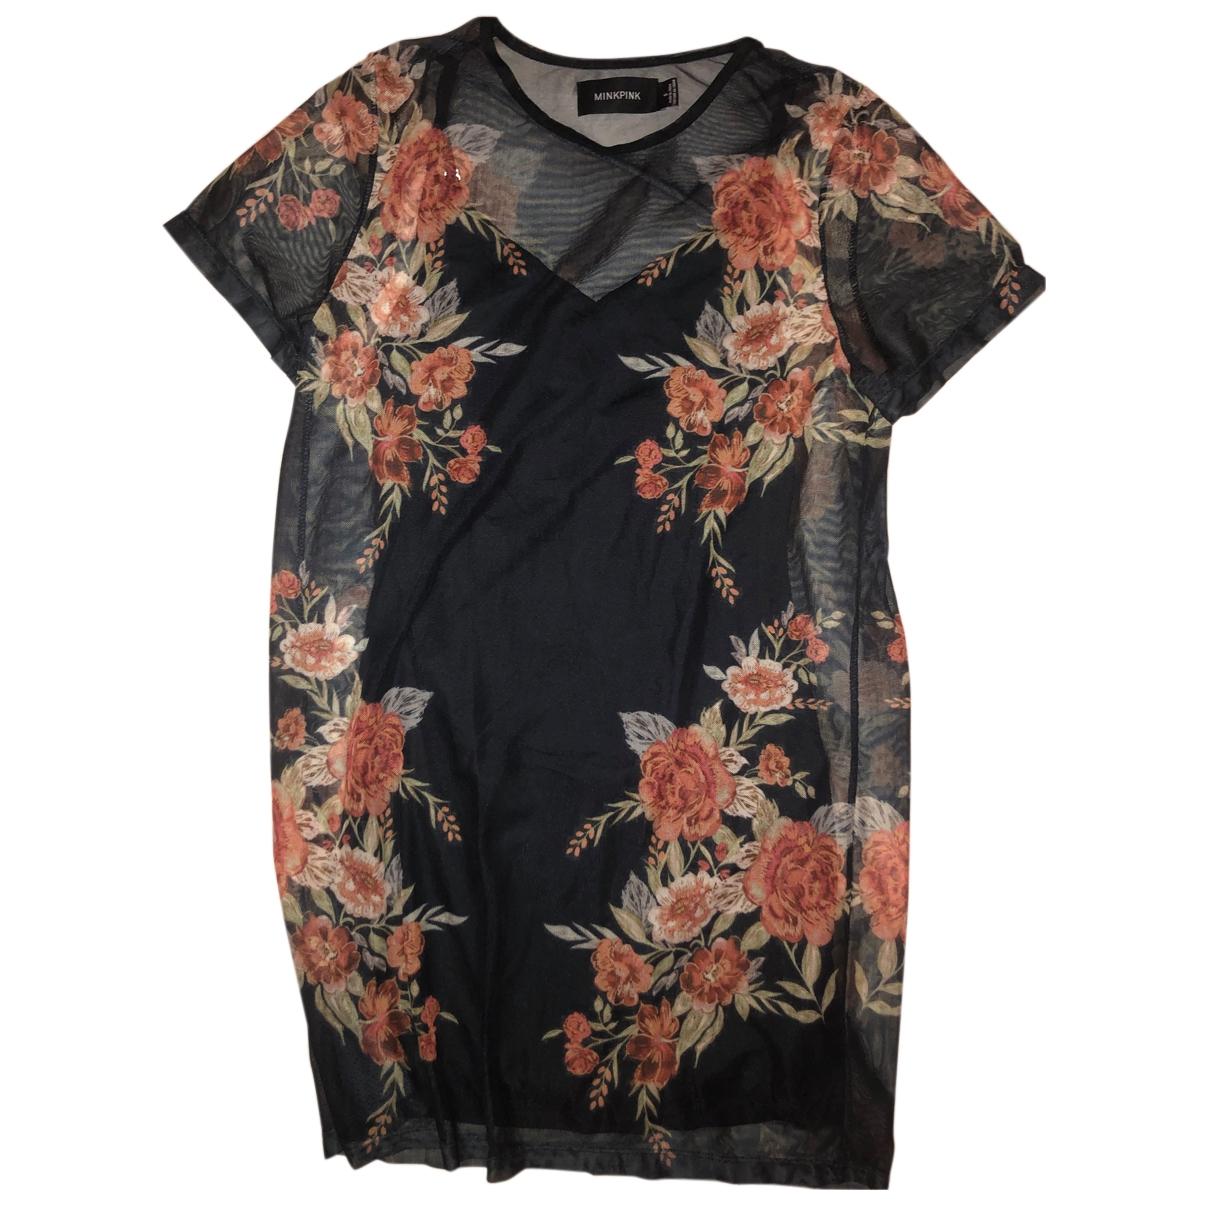 Minkpink \N Black dress for Women S International